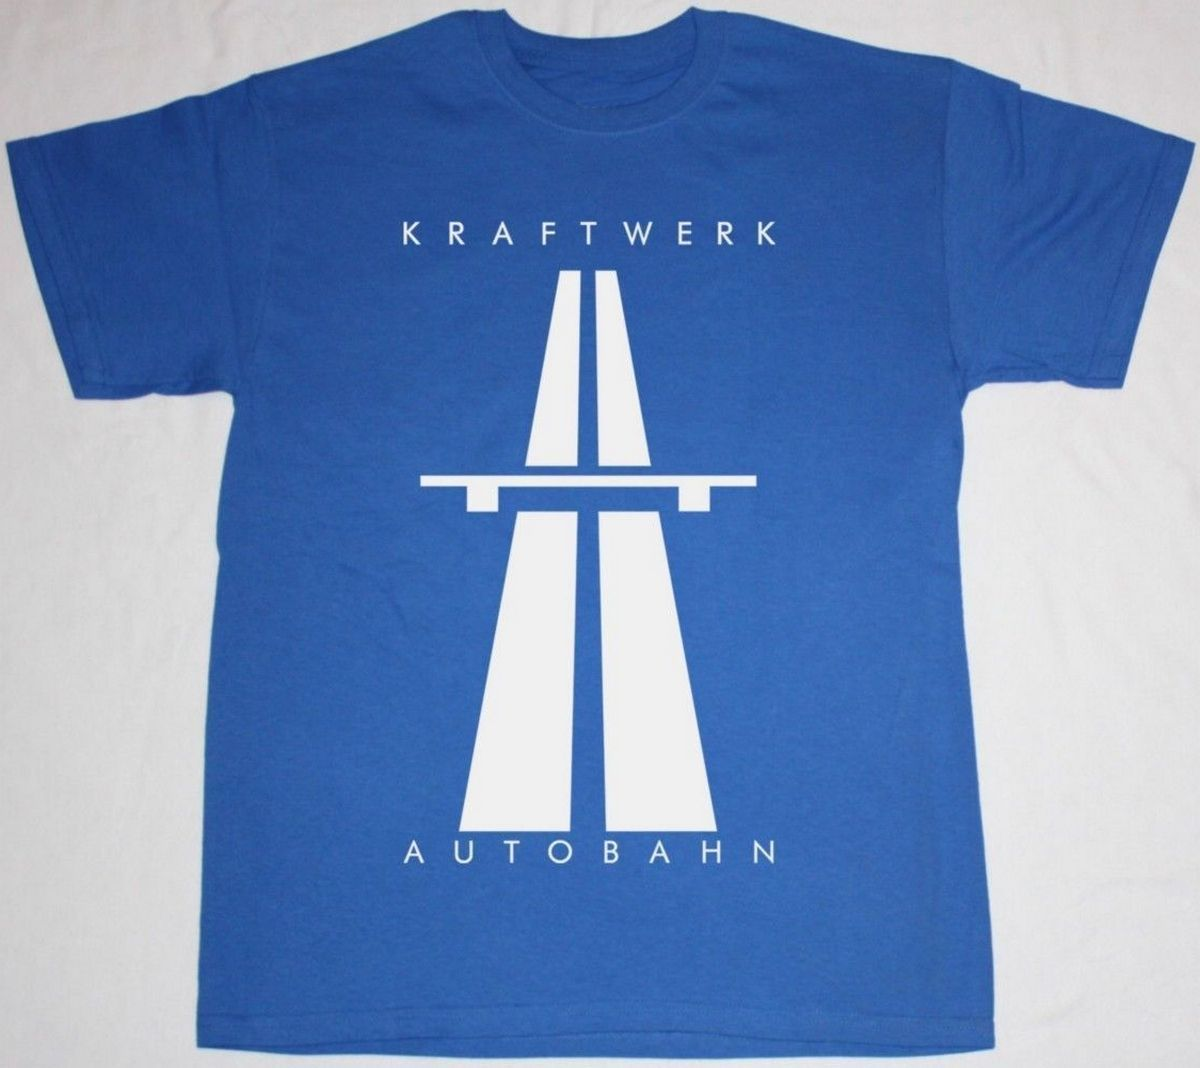 KRAFTWERK AUTOBAHN KRAUTROCK ELECTRONIC SYNTHROCK NEW ROYAL BLUE T-SHIRT New Fashion T Shirt Graphic Letter